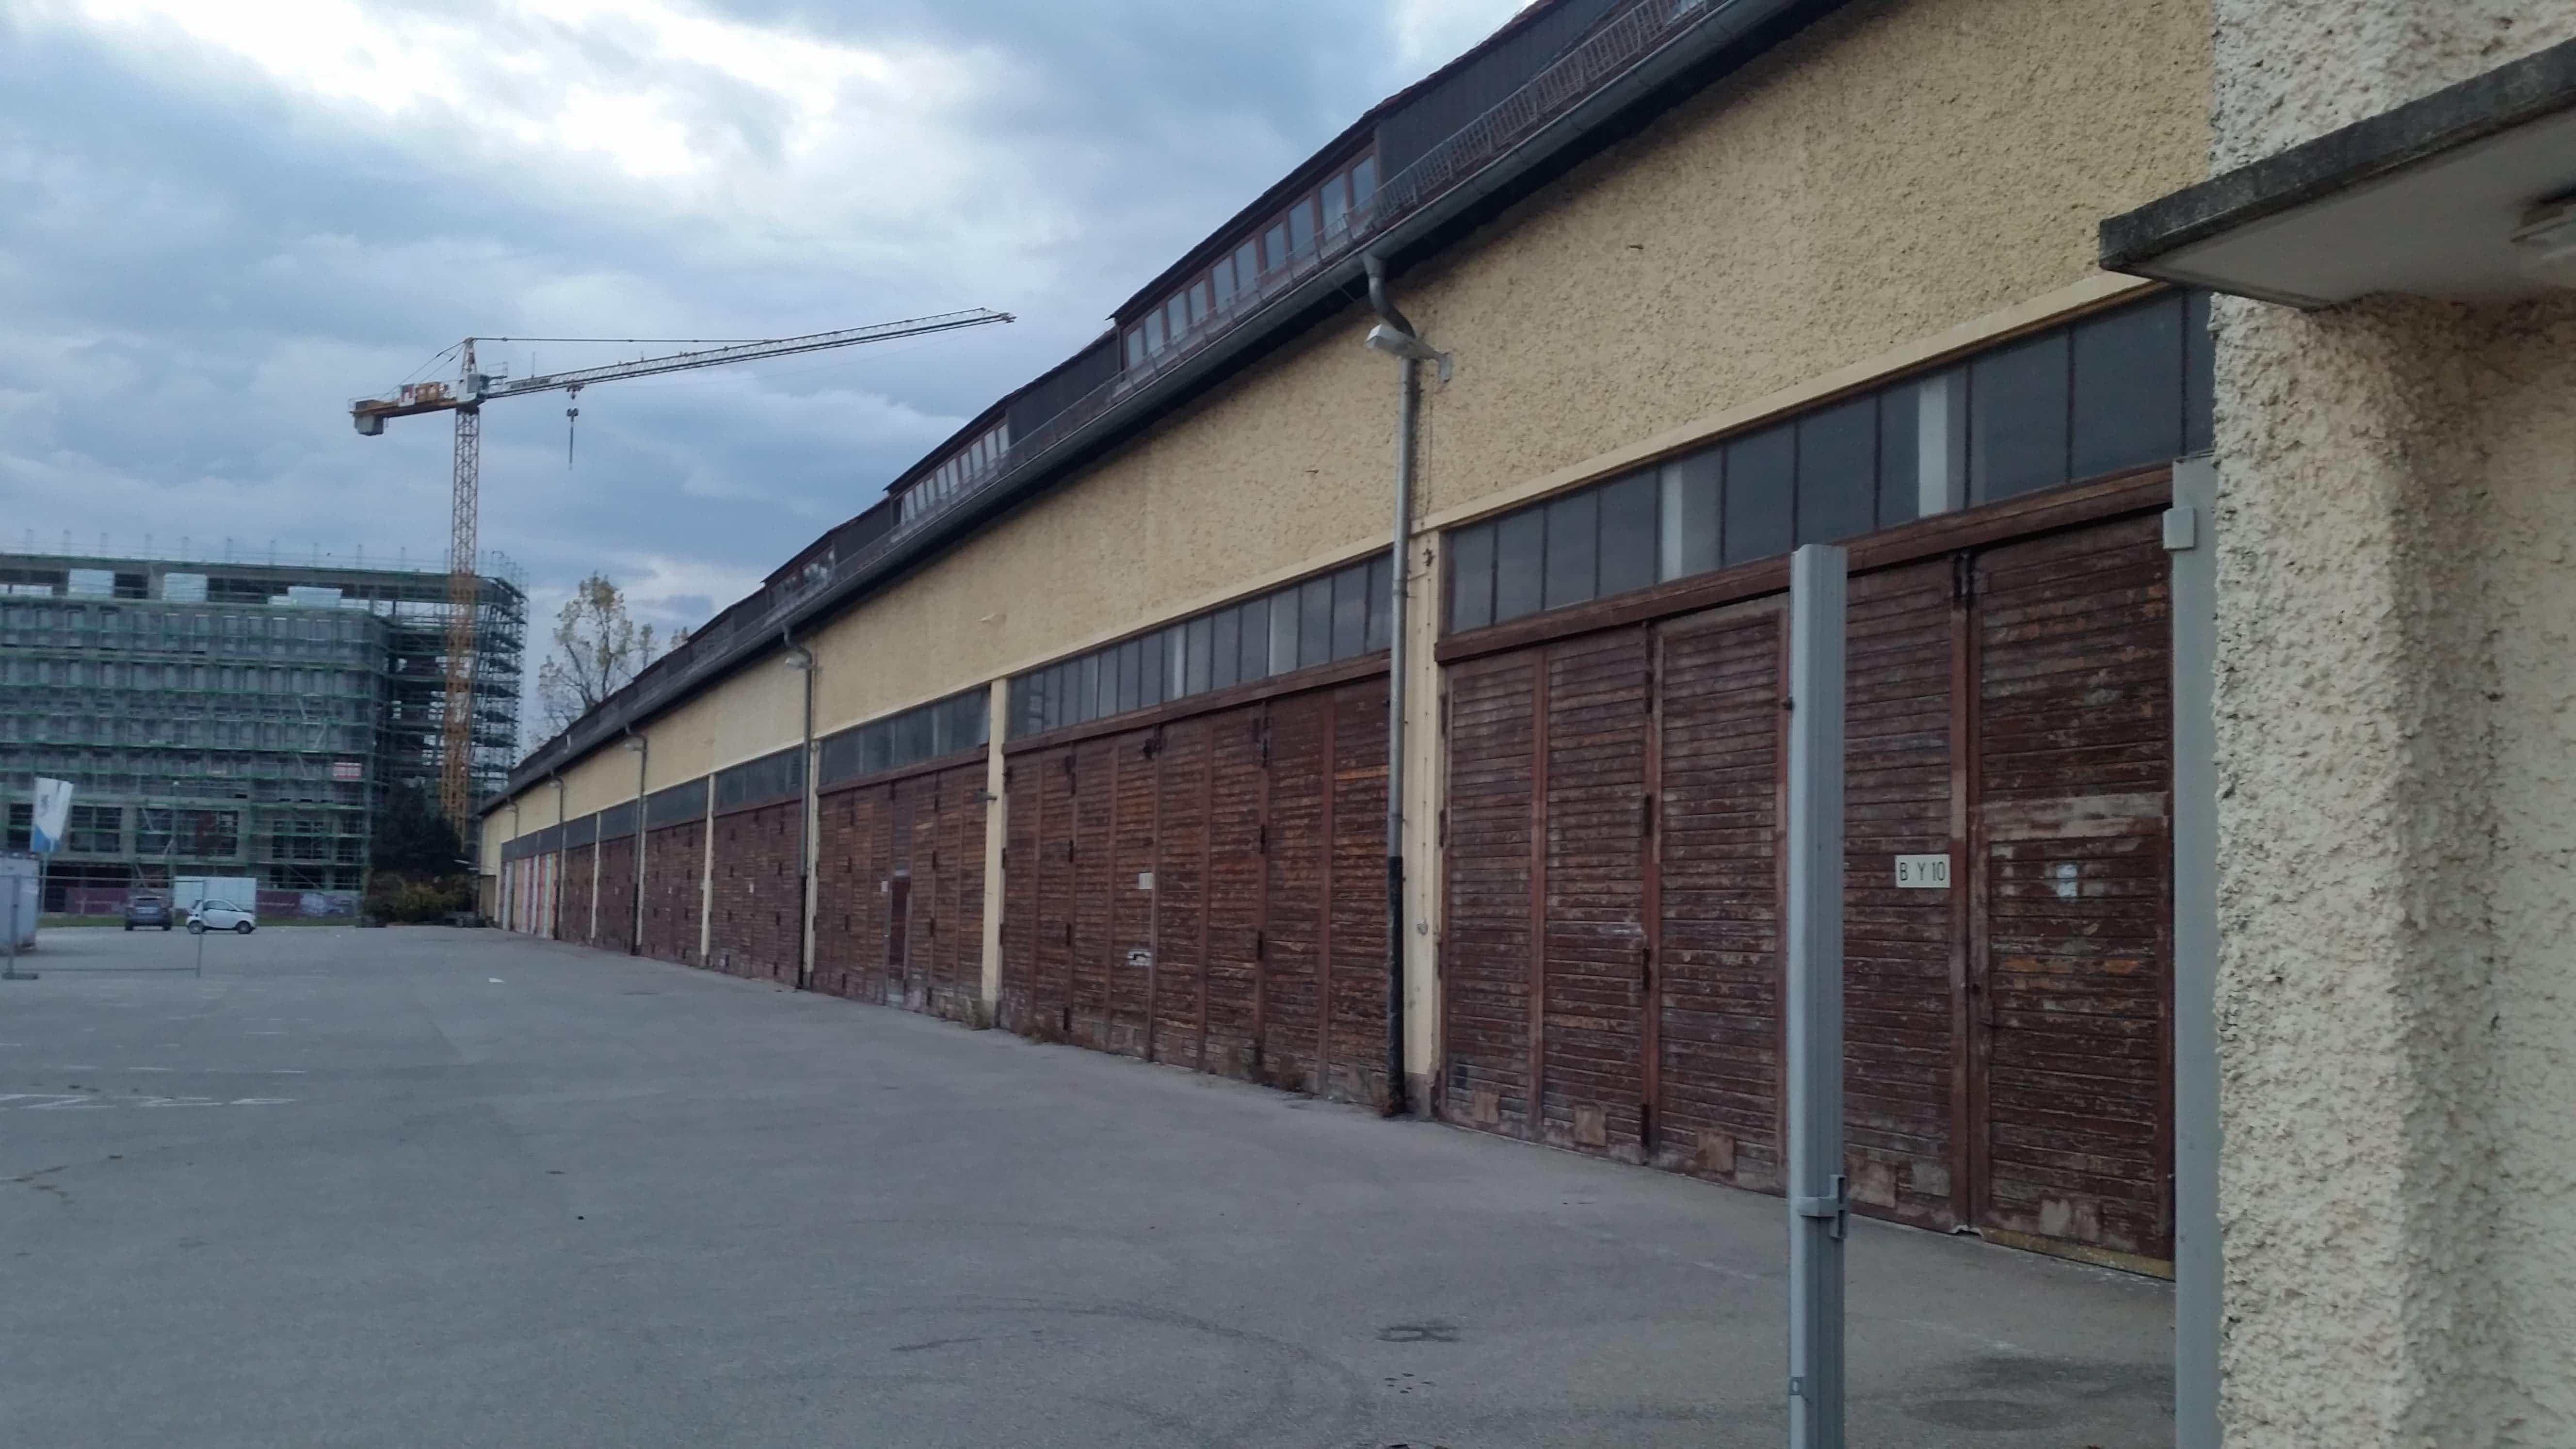 Halle 116 (c) DAZ